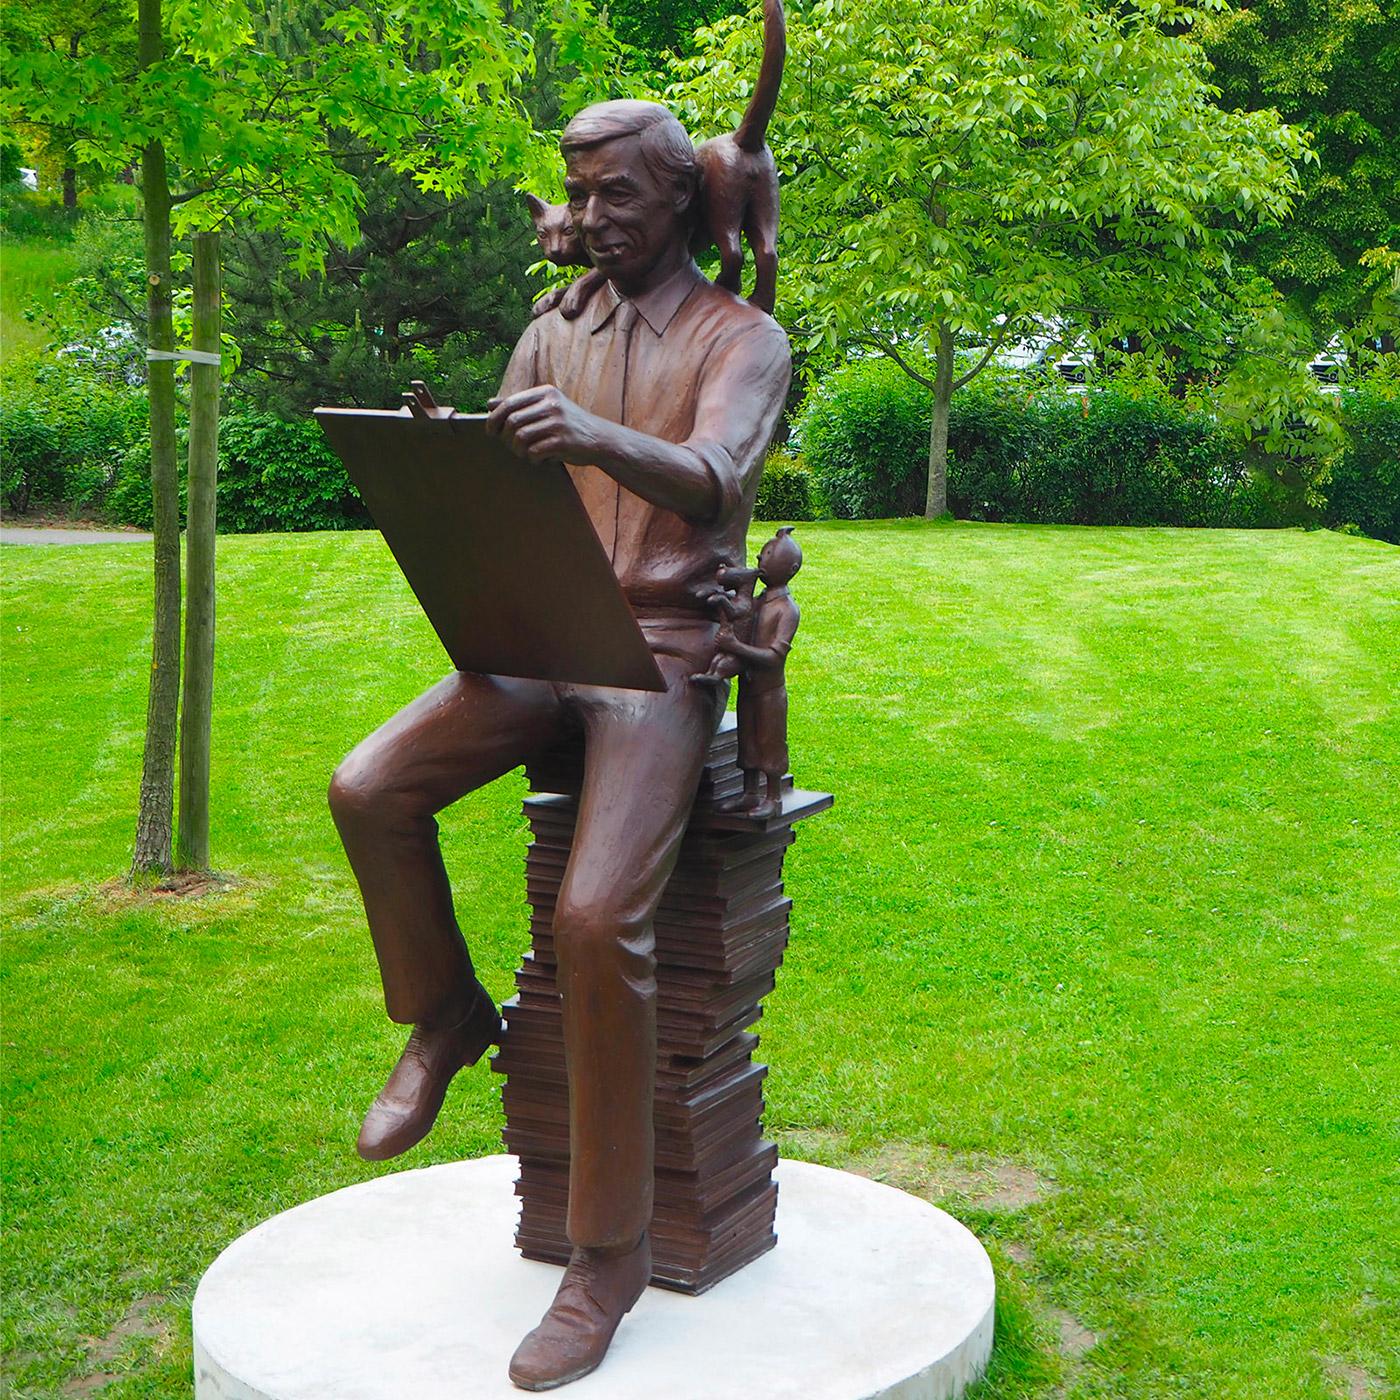 Hergé Sculpture Frantzen